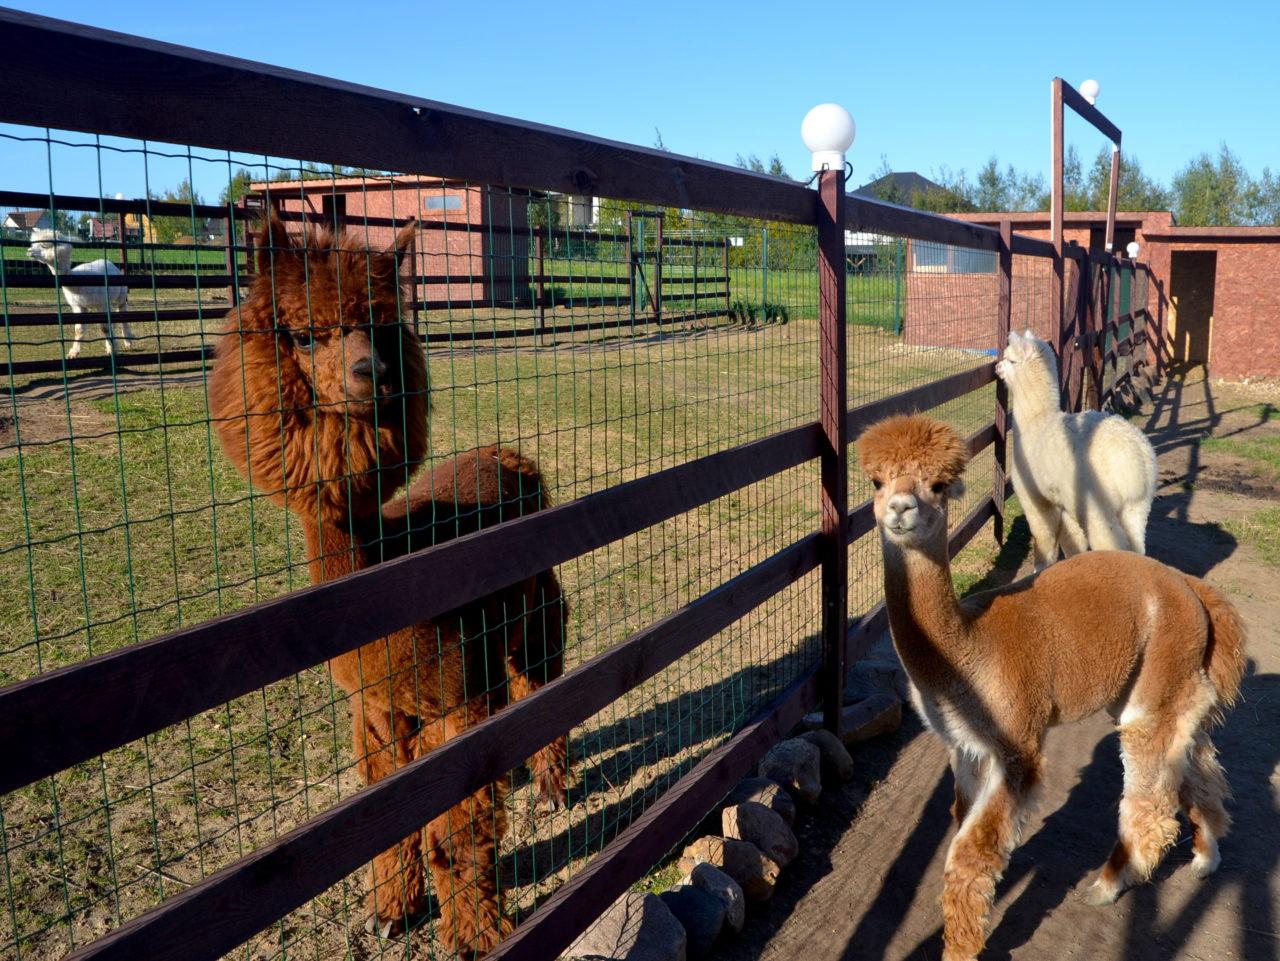 Insgesamt 15 Alpakas unterschiedlicher Fellfarbe leben hier. / Ljubawa Winokurowa